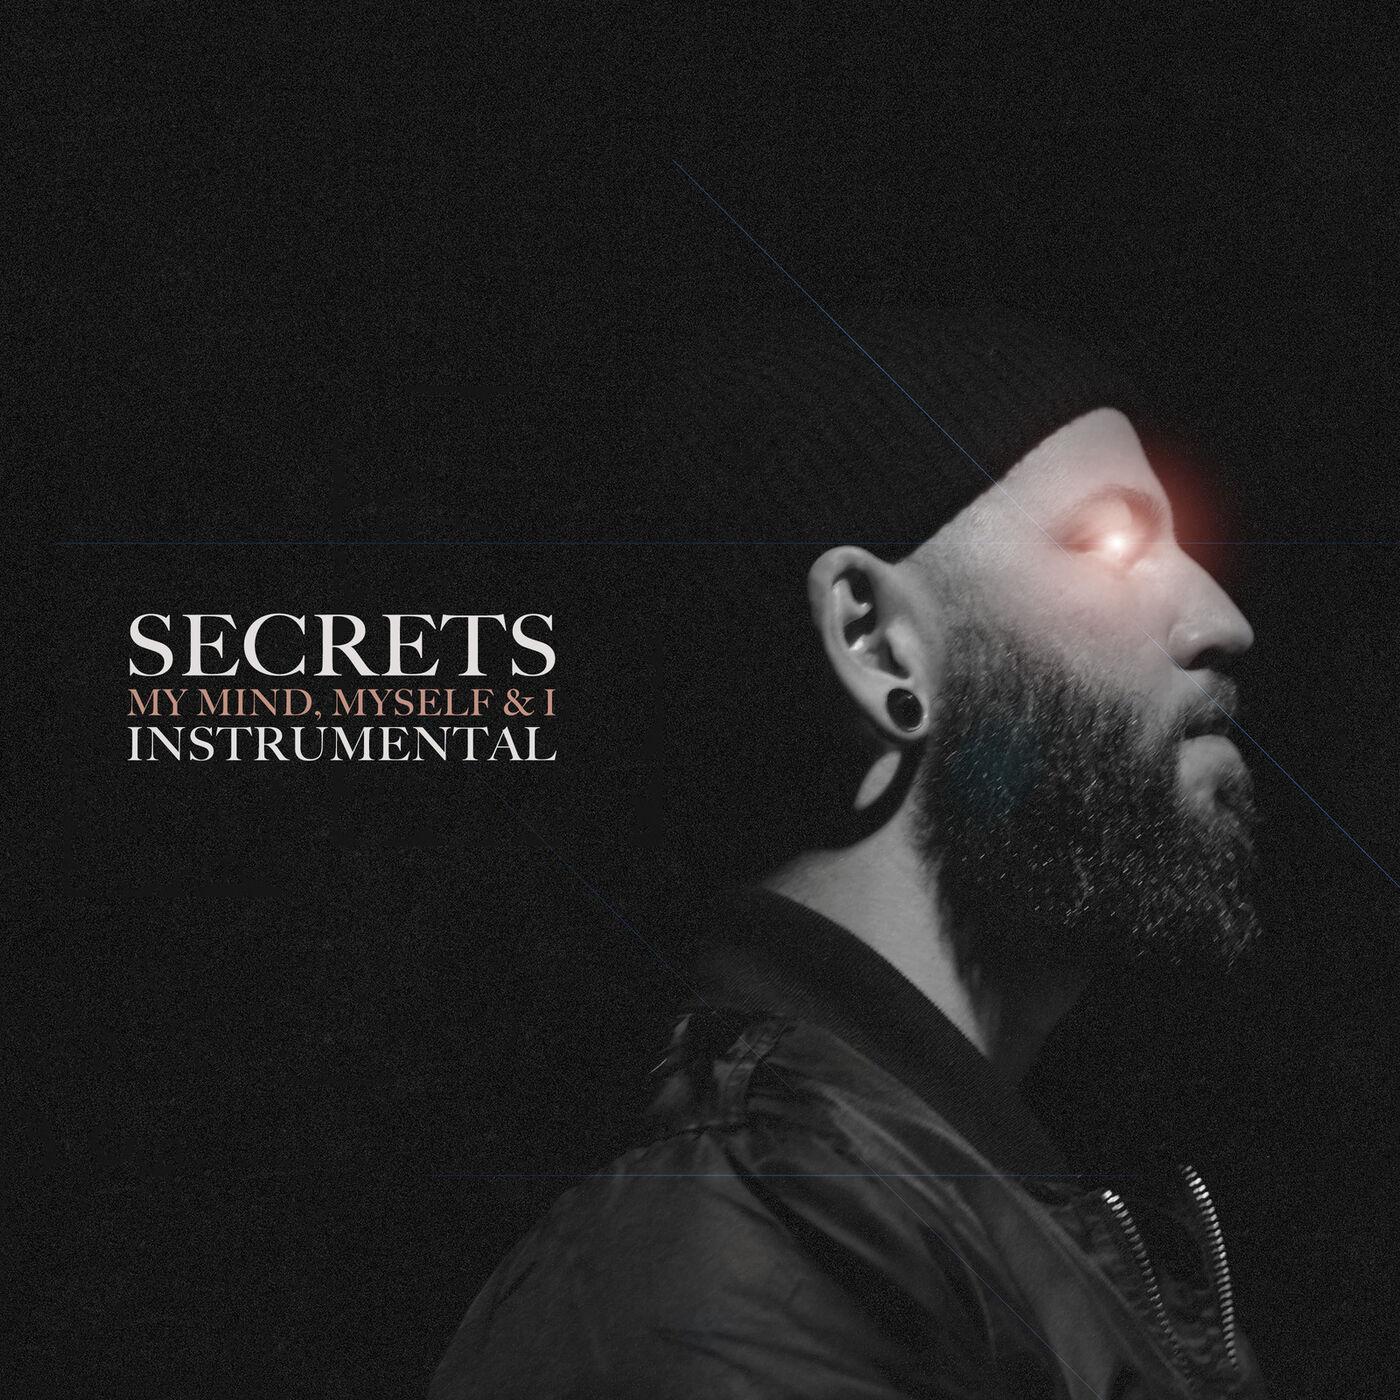 Secrets - My Mind, Myself & I (Instrumental) [single] (2020)